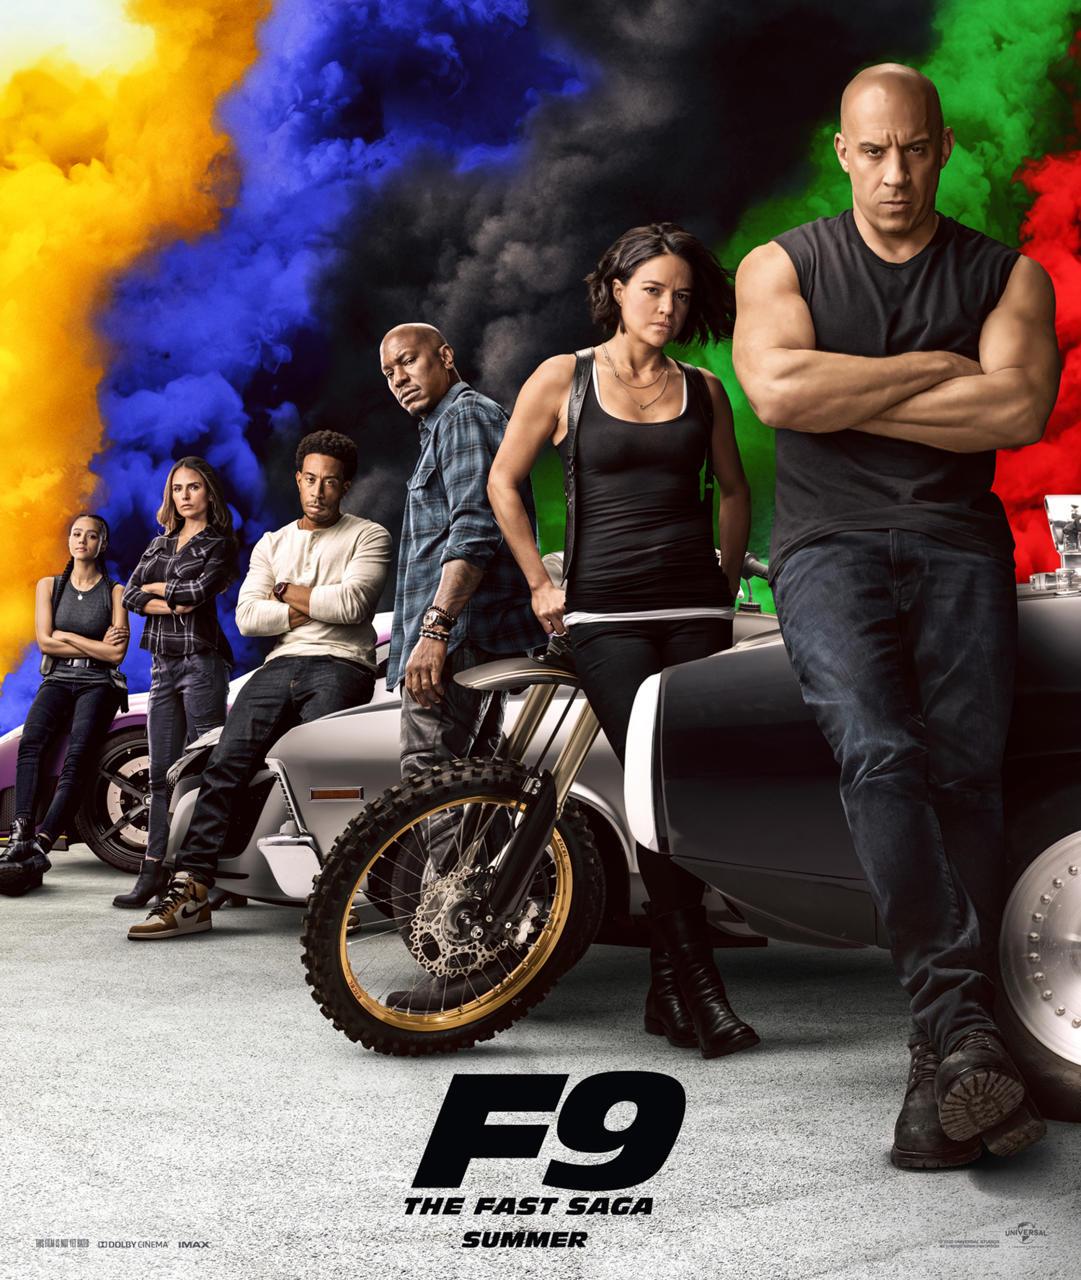 9. F9: The Fast Saga